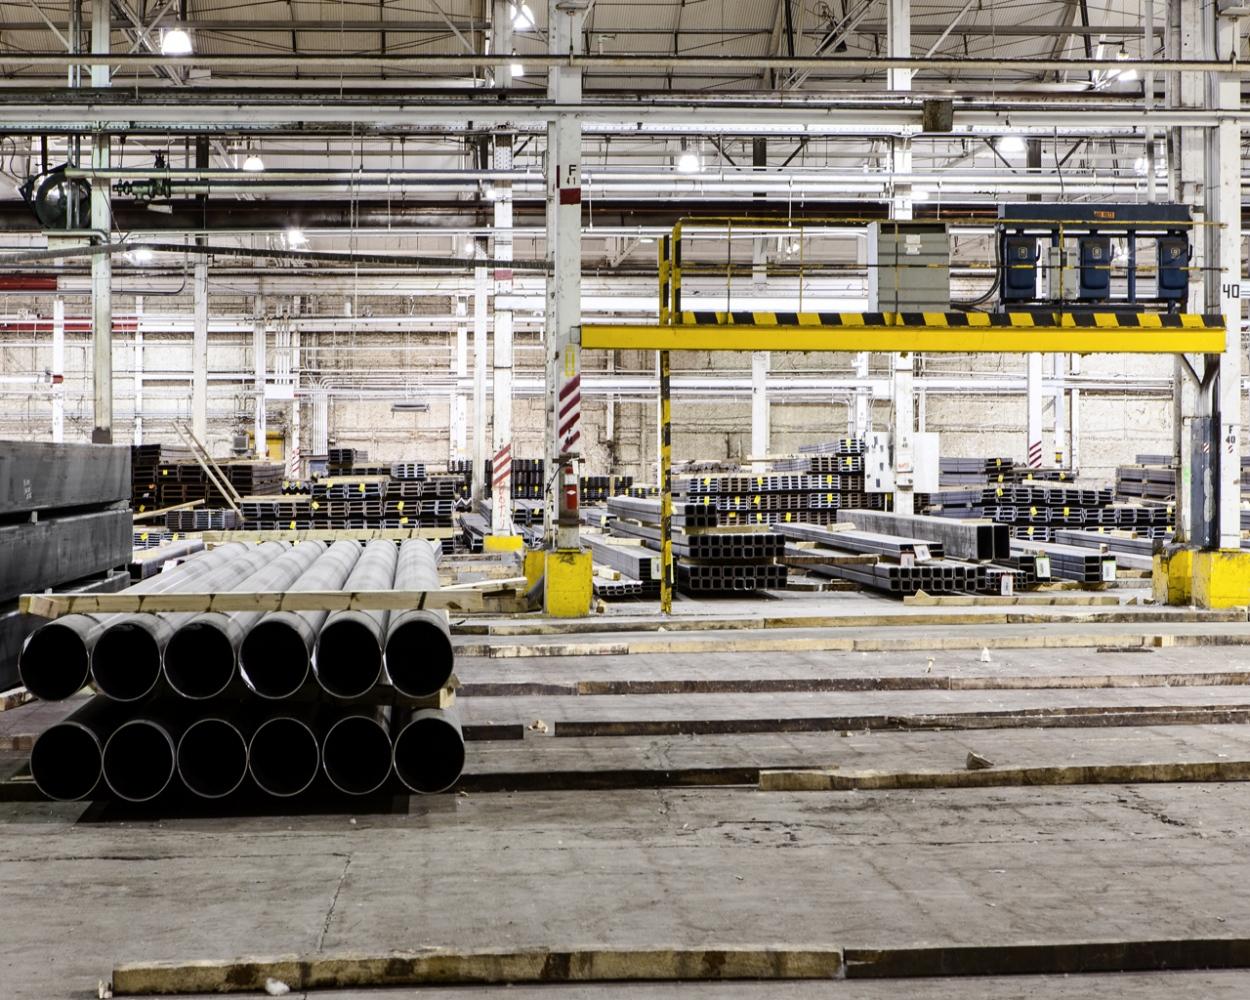 Steel Tubing (GLR), Chicago, IL  2012